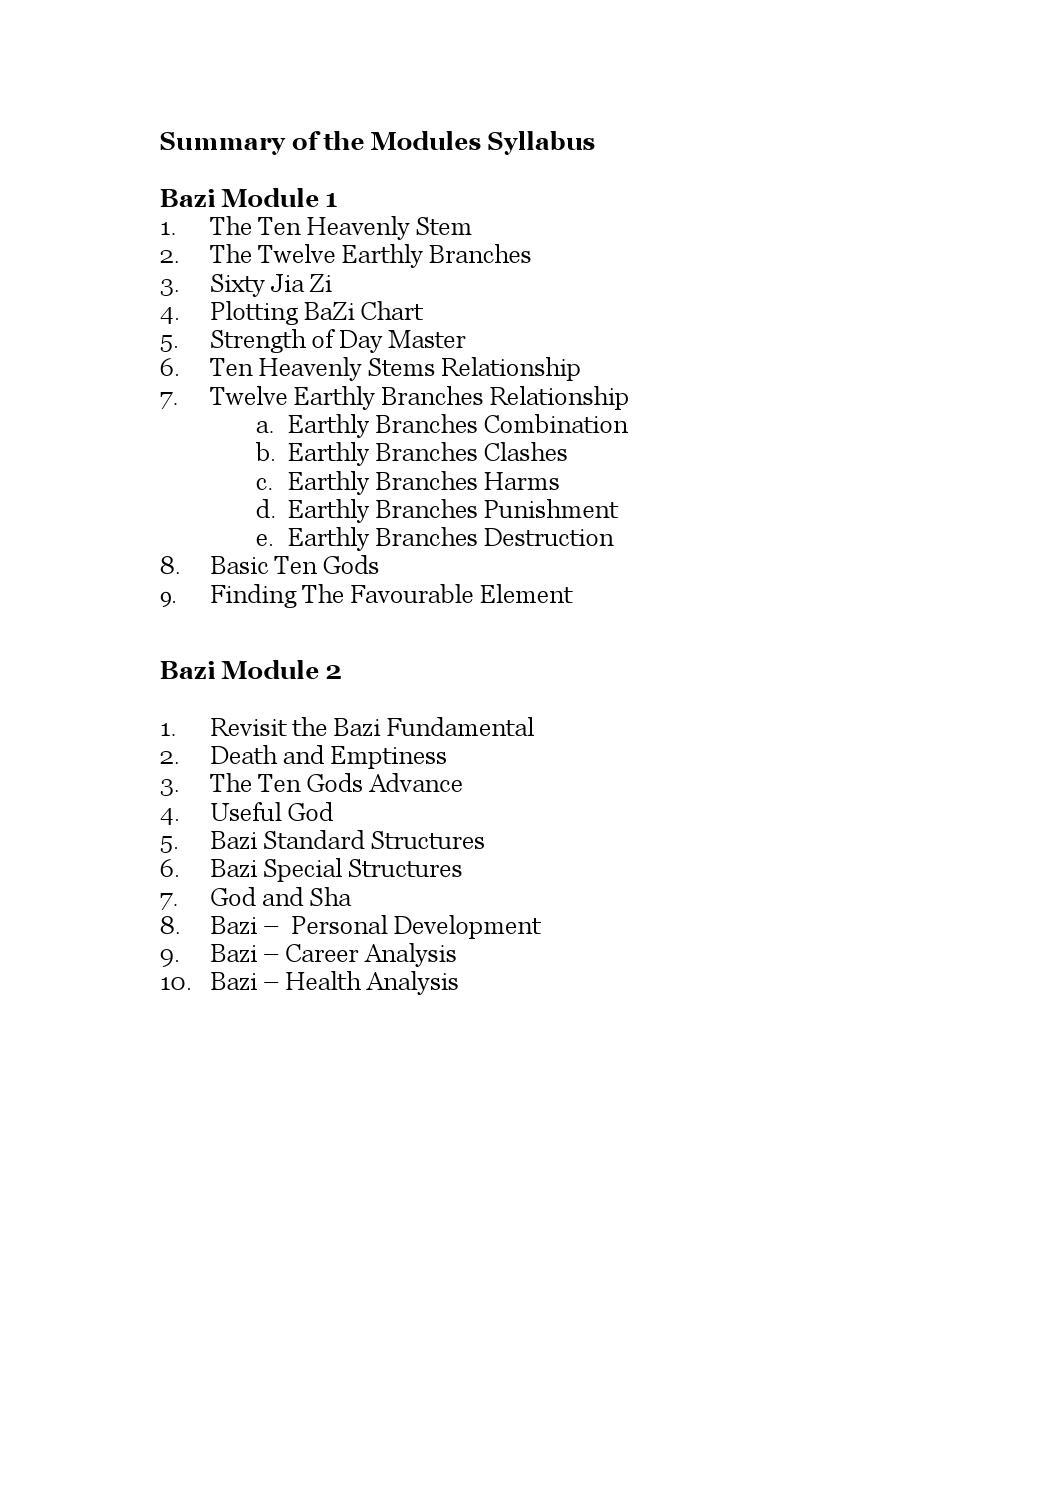 Summary of the Bazi Syllabus M1 & M2 by Josephine Phang - issuu